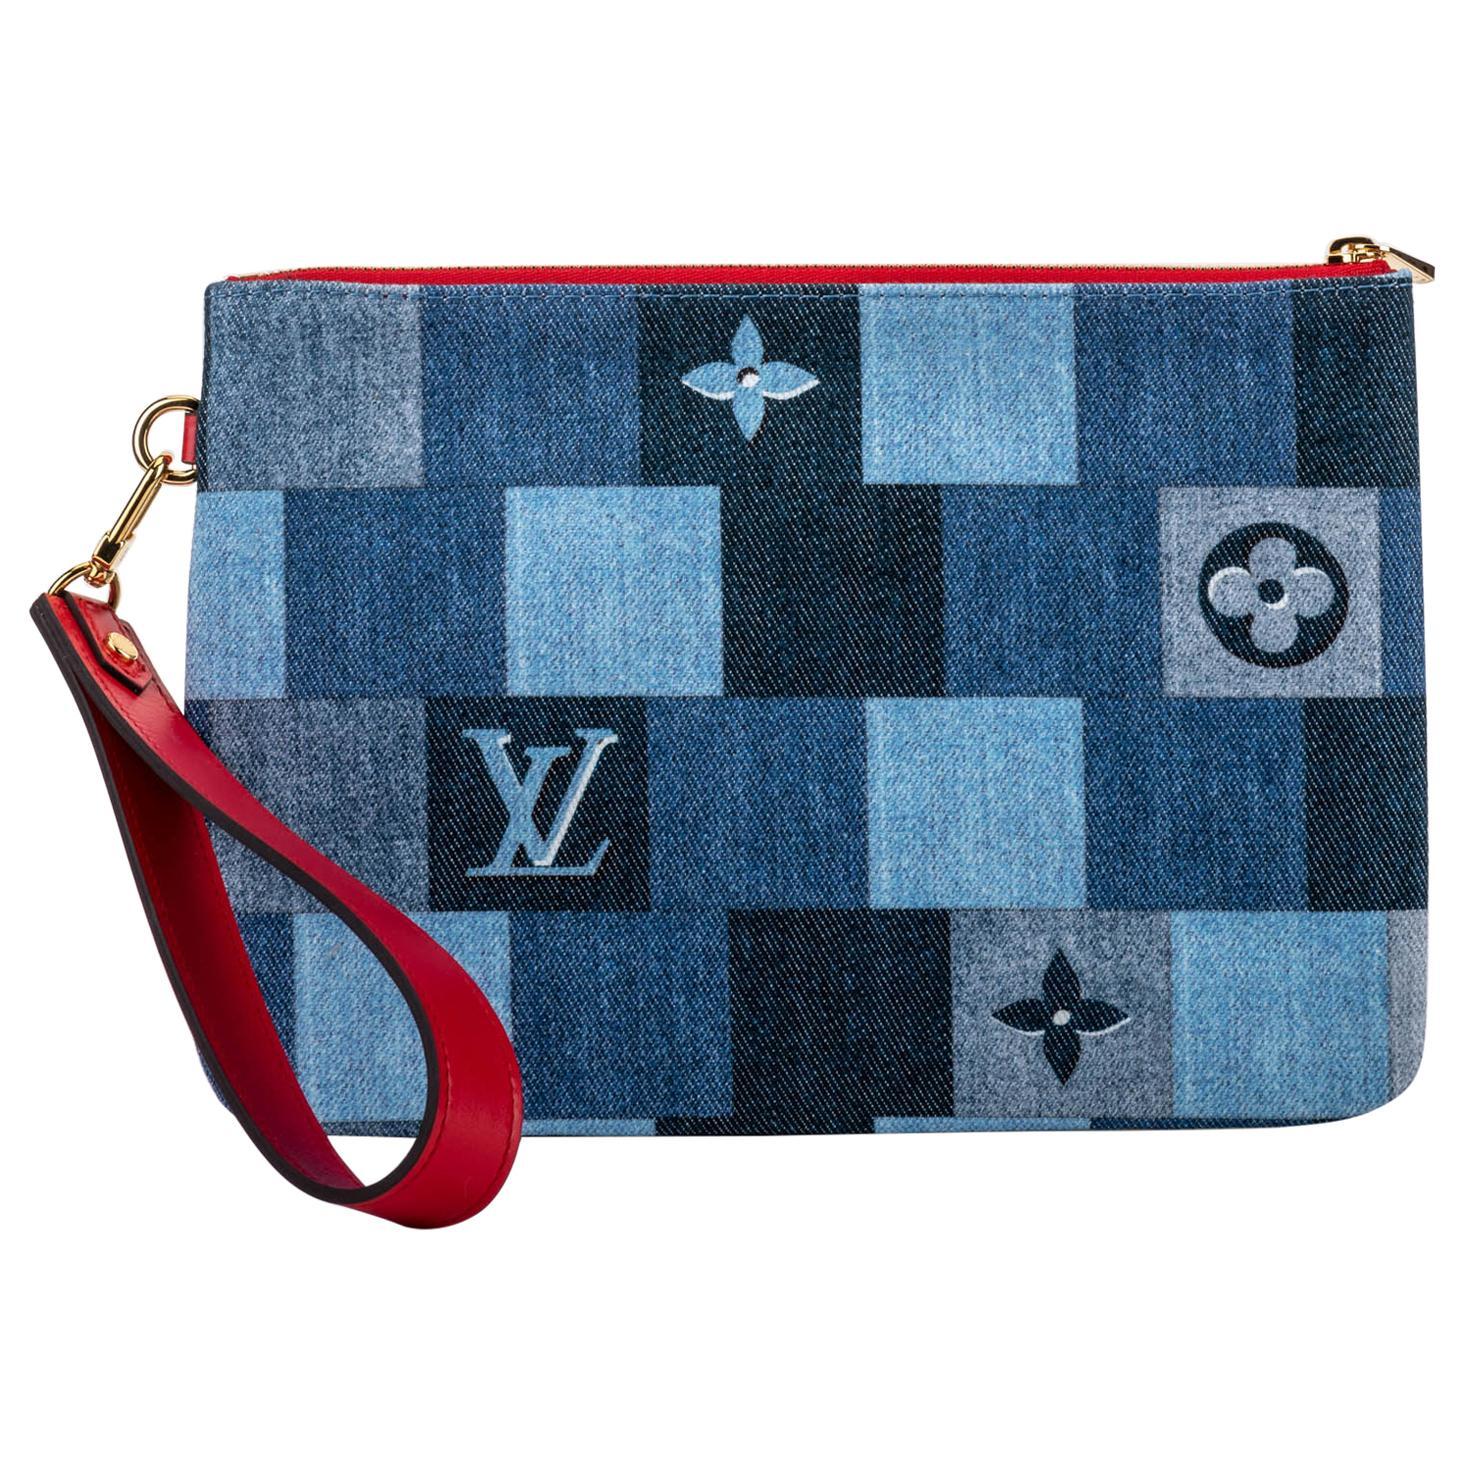 New in Box Vuitton Denim Pochette Bag